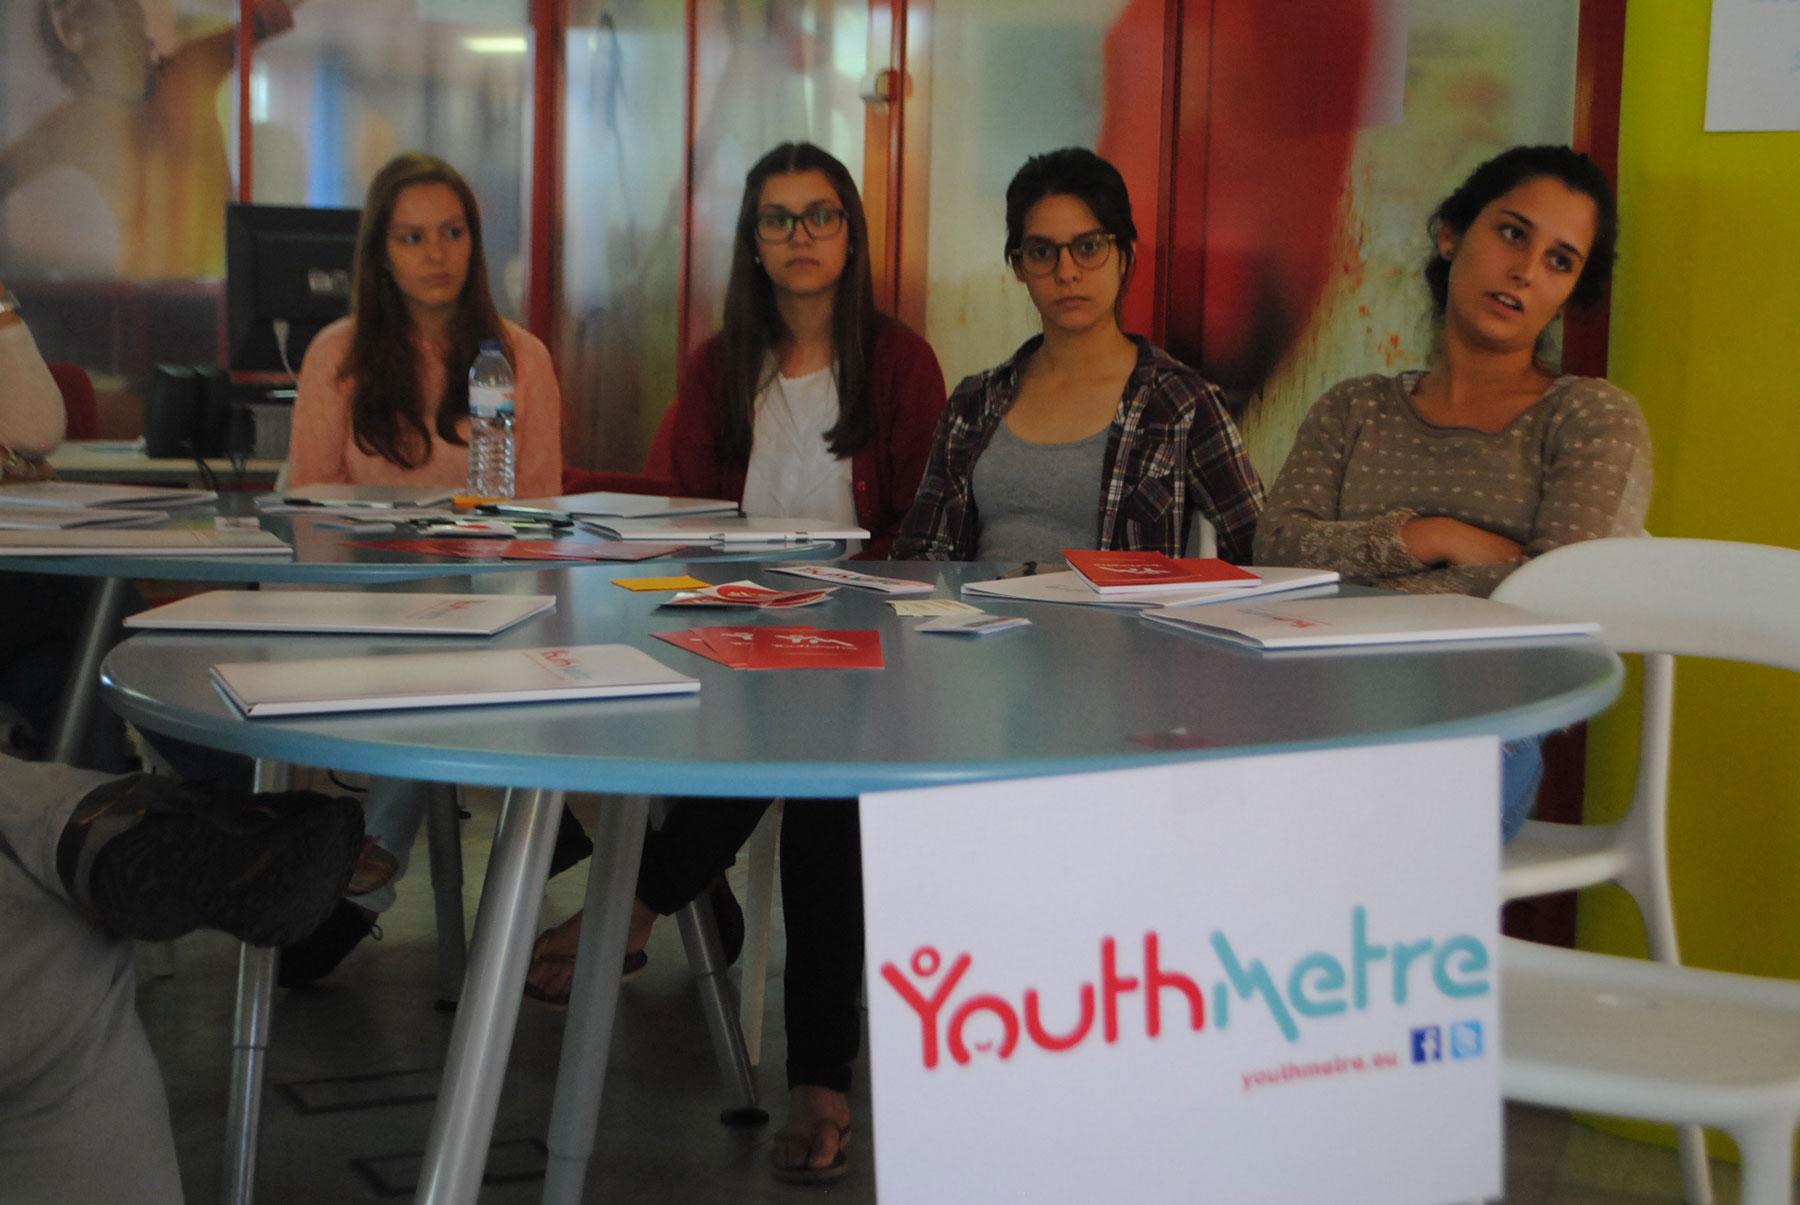 Portoalegre YouthMetre Study Group